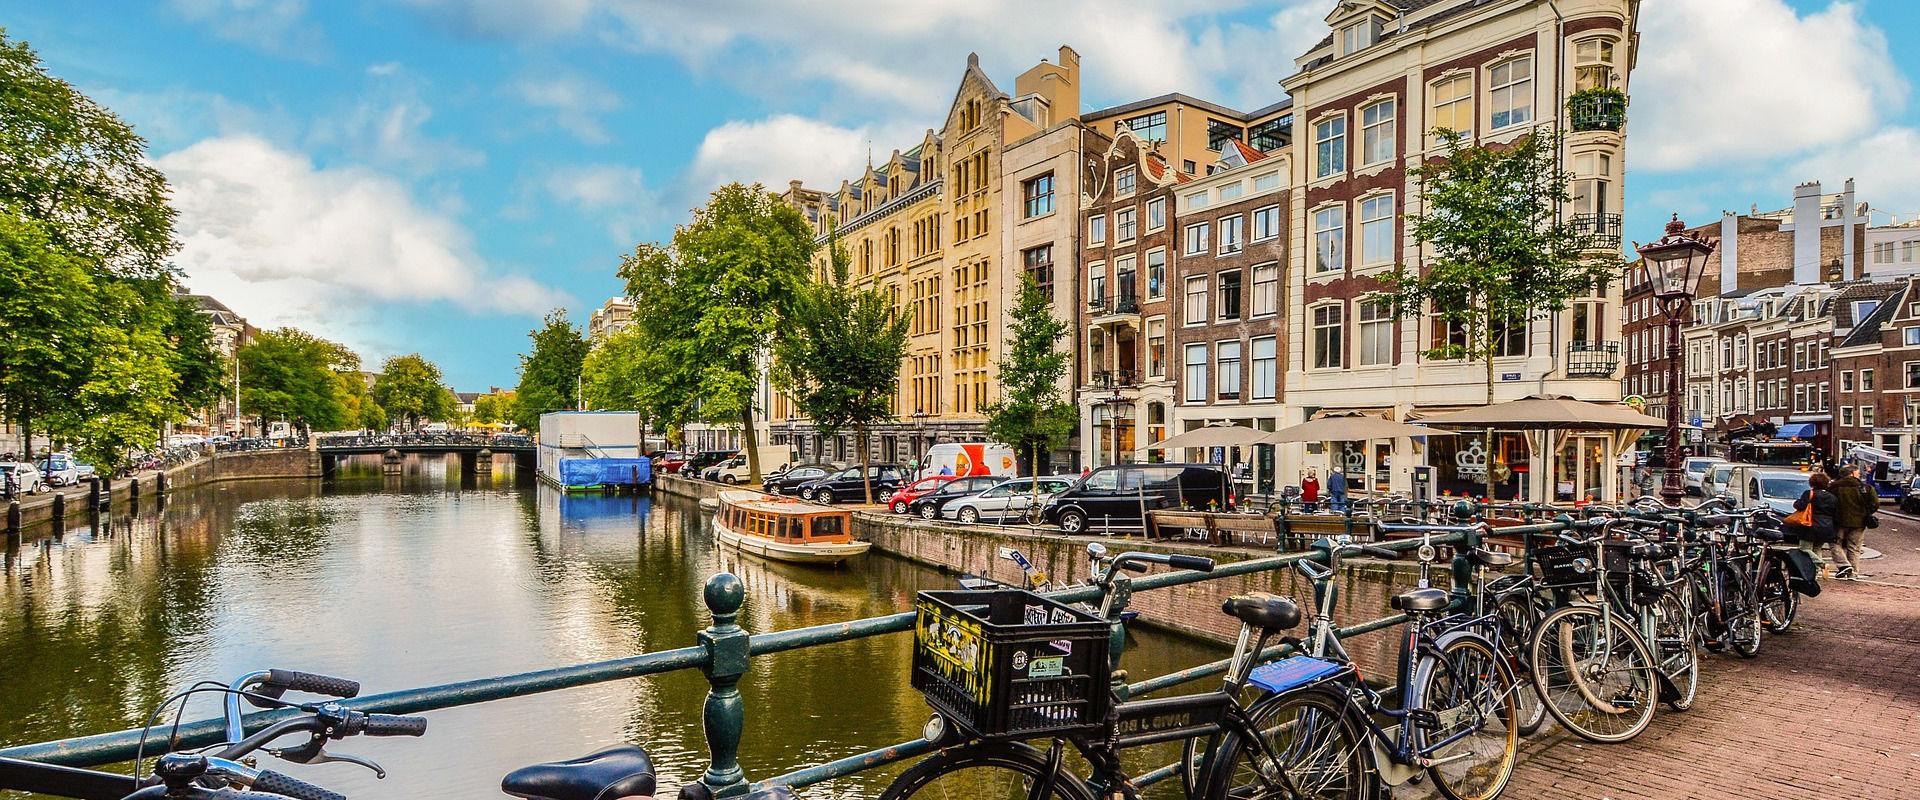 amsterdam-baslik.jpg